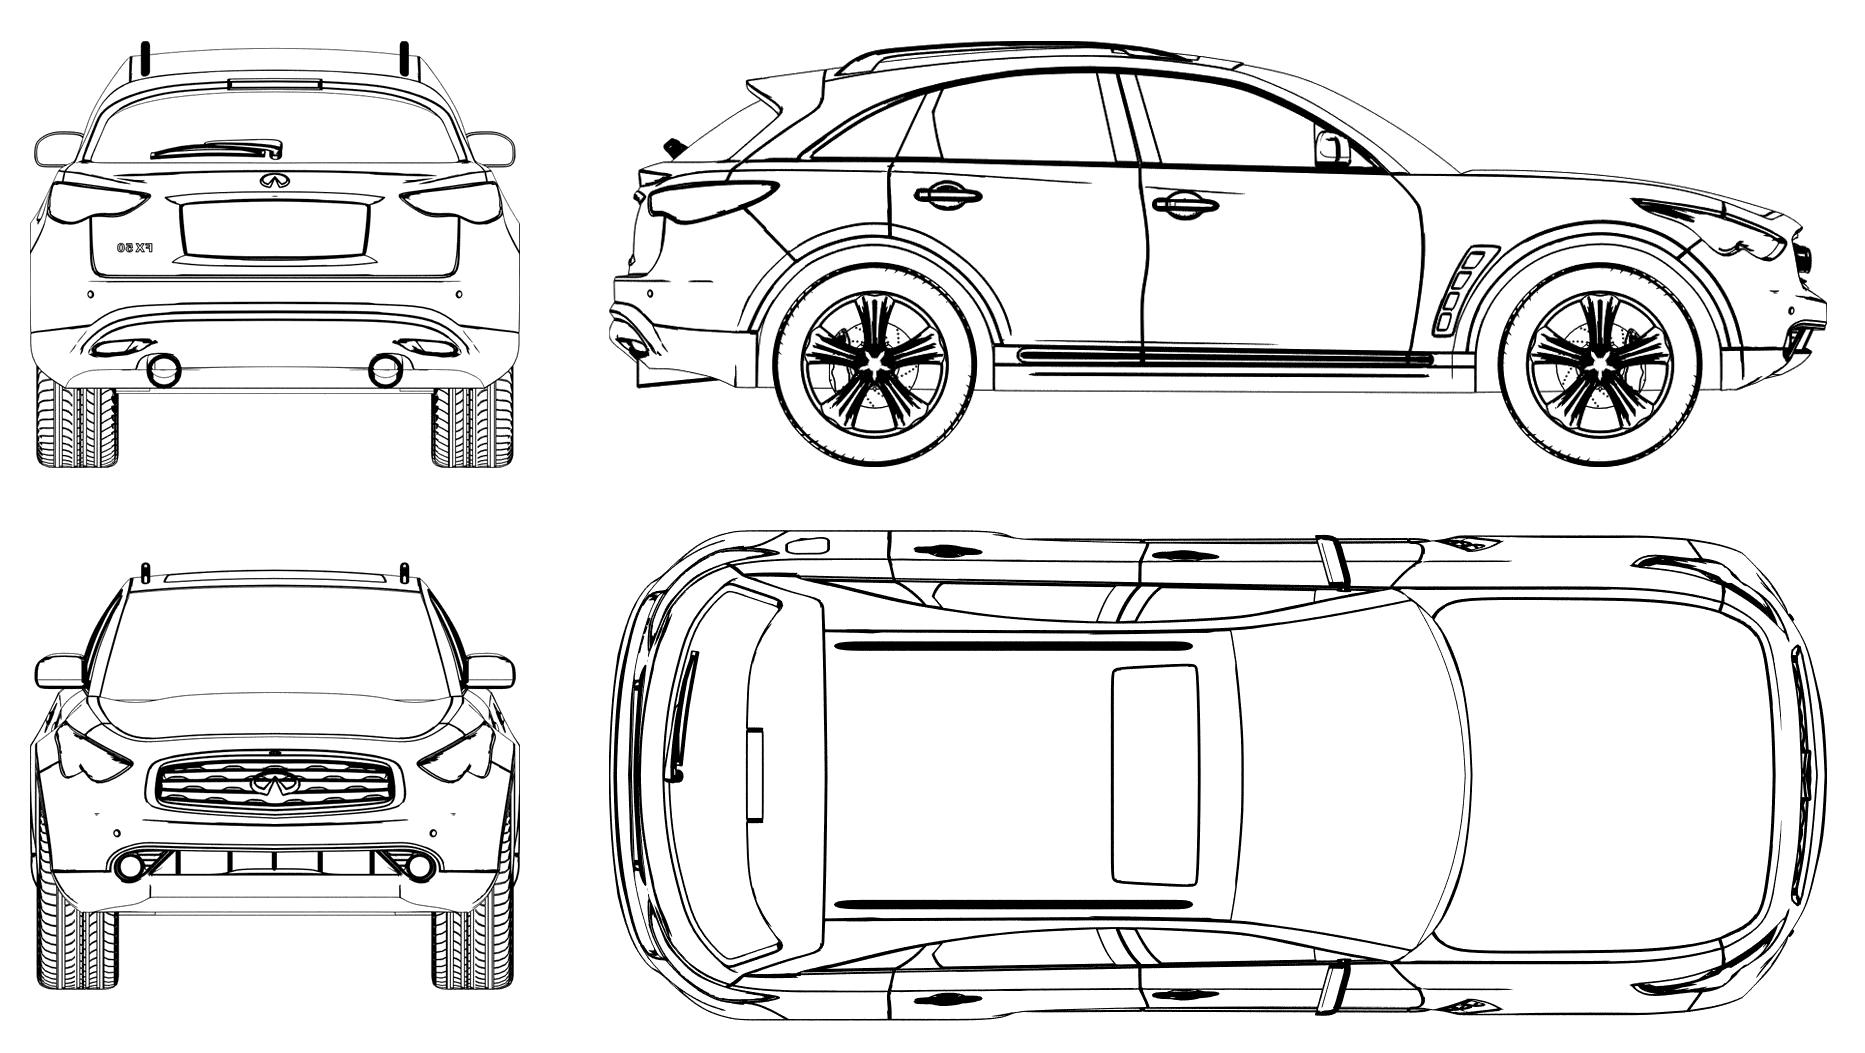 Infiniti FX blueprints